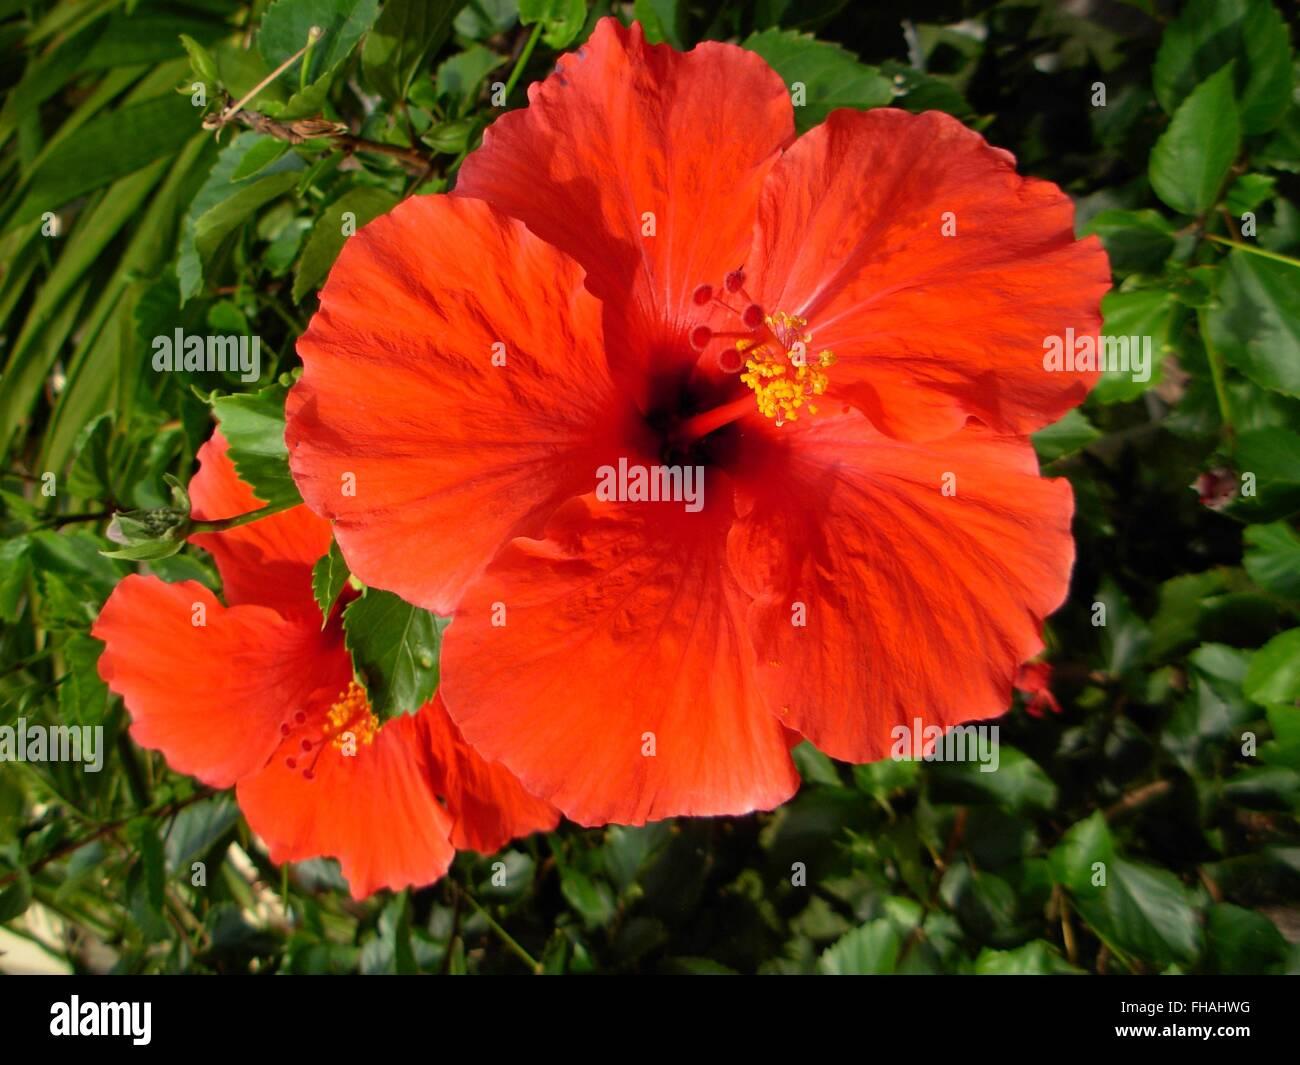 Red hibiscus flower in full bloom hawaii usa stock photo 96734556 red hibiscus flower in full bloom hawaii usa izmirmasajfo